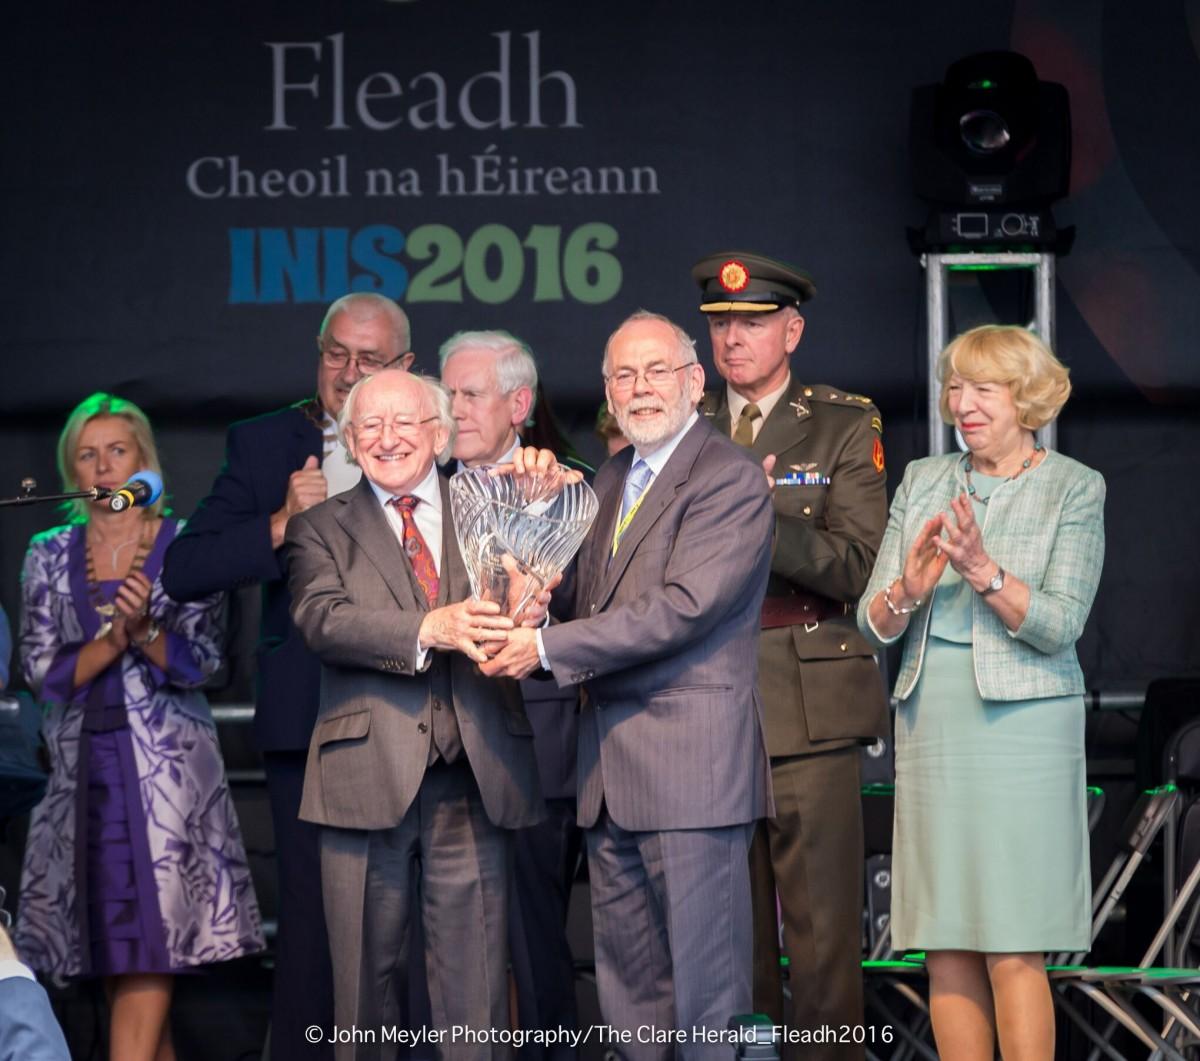 President Michael D. Higgins makes a presentation to Micheál Ó Riabhaigh.